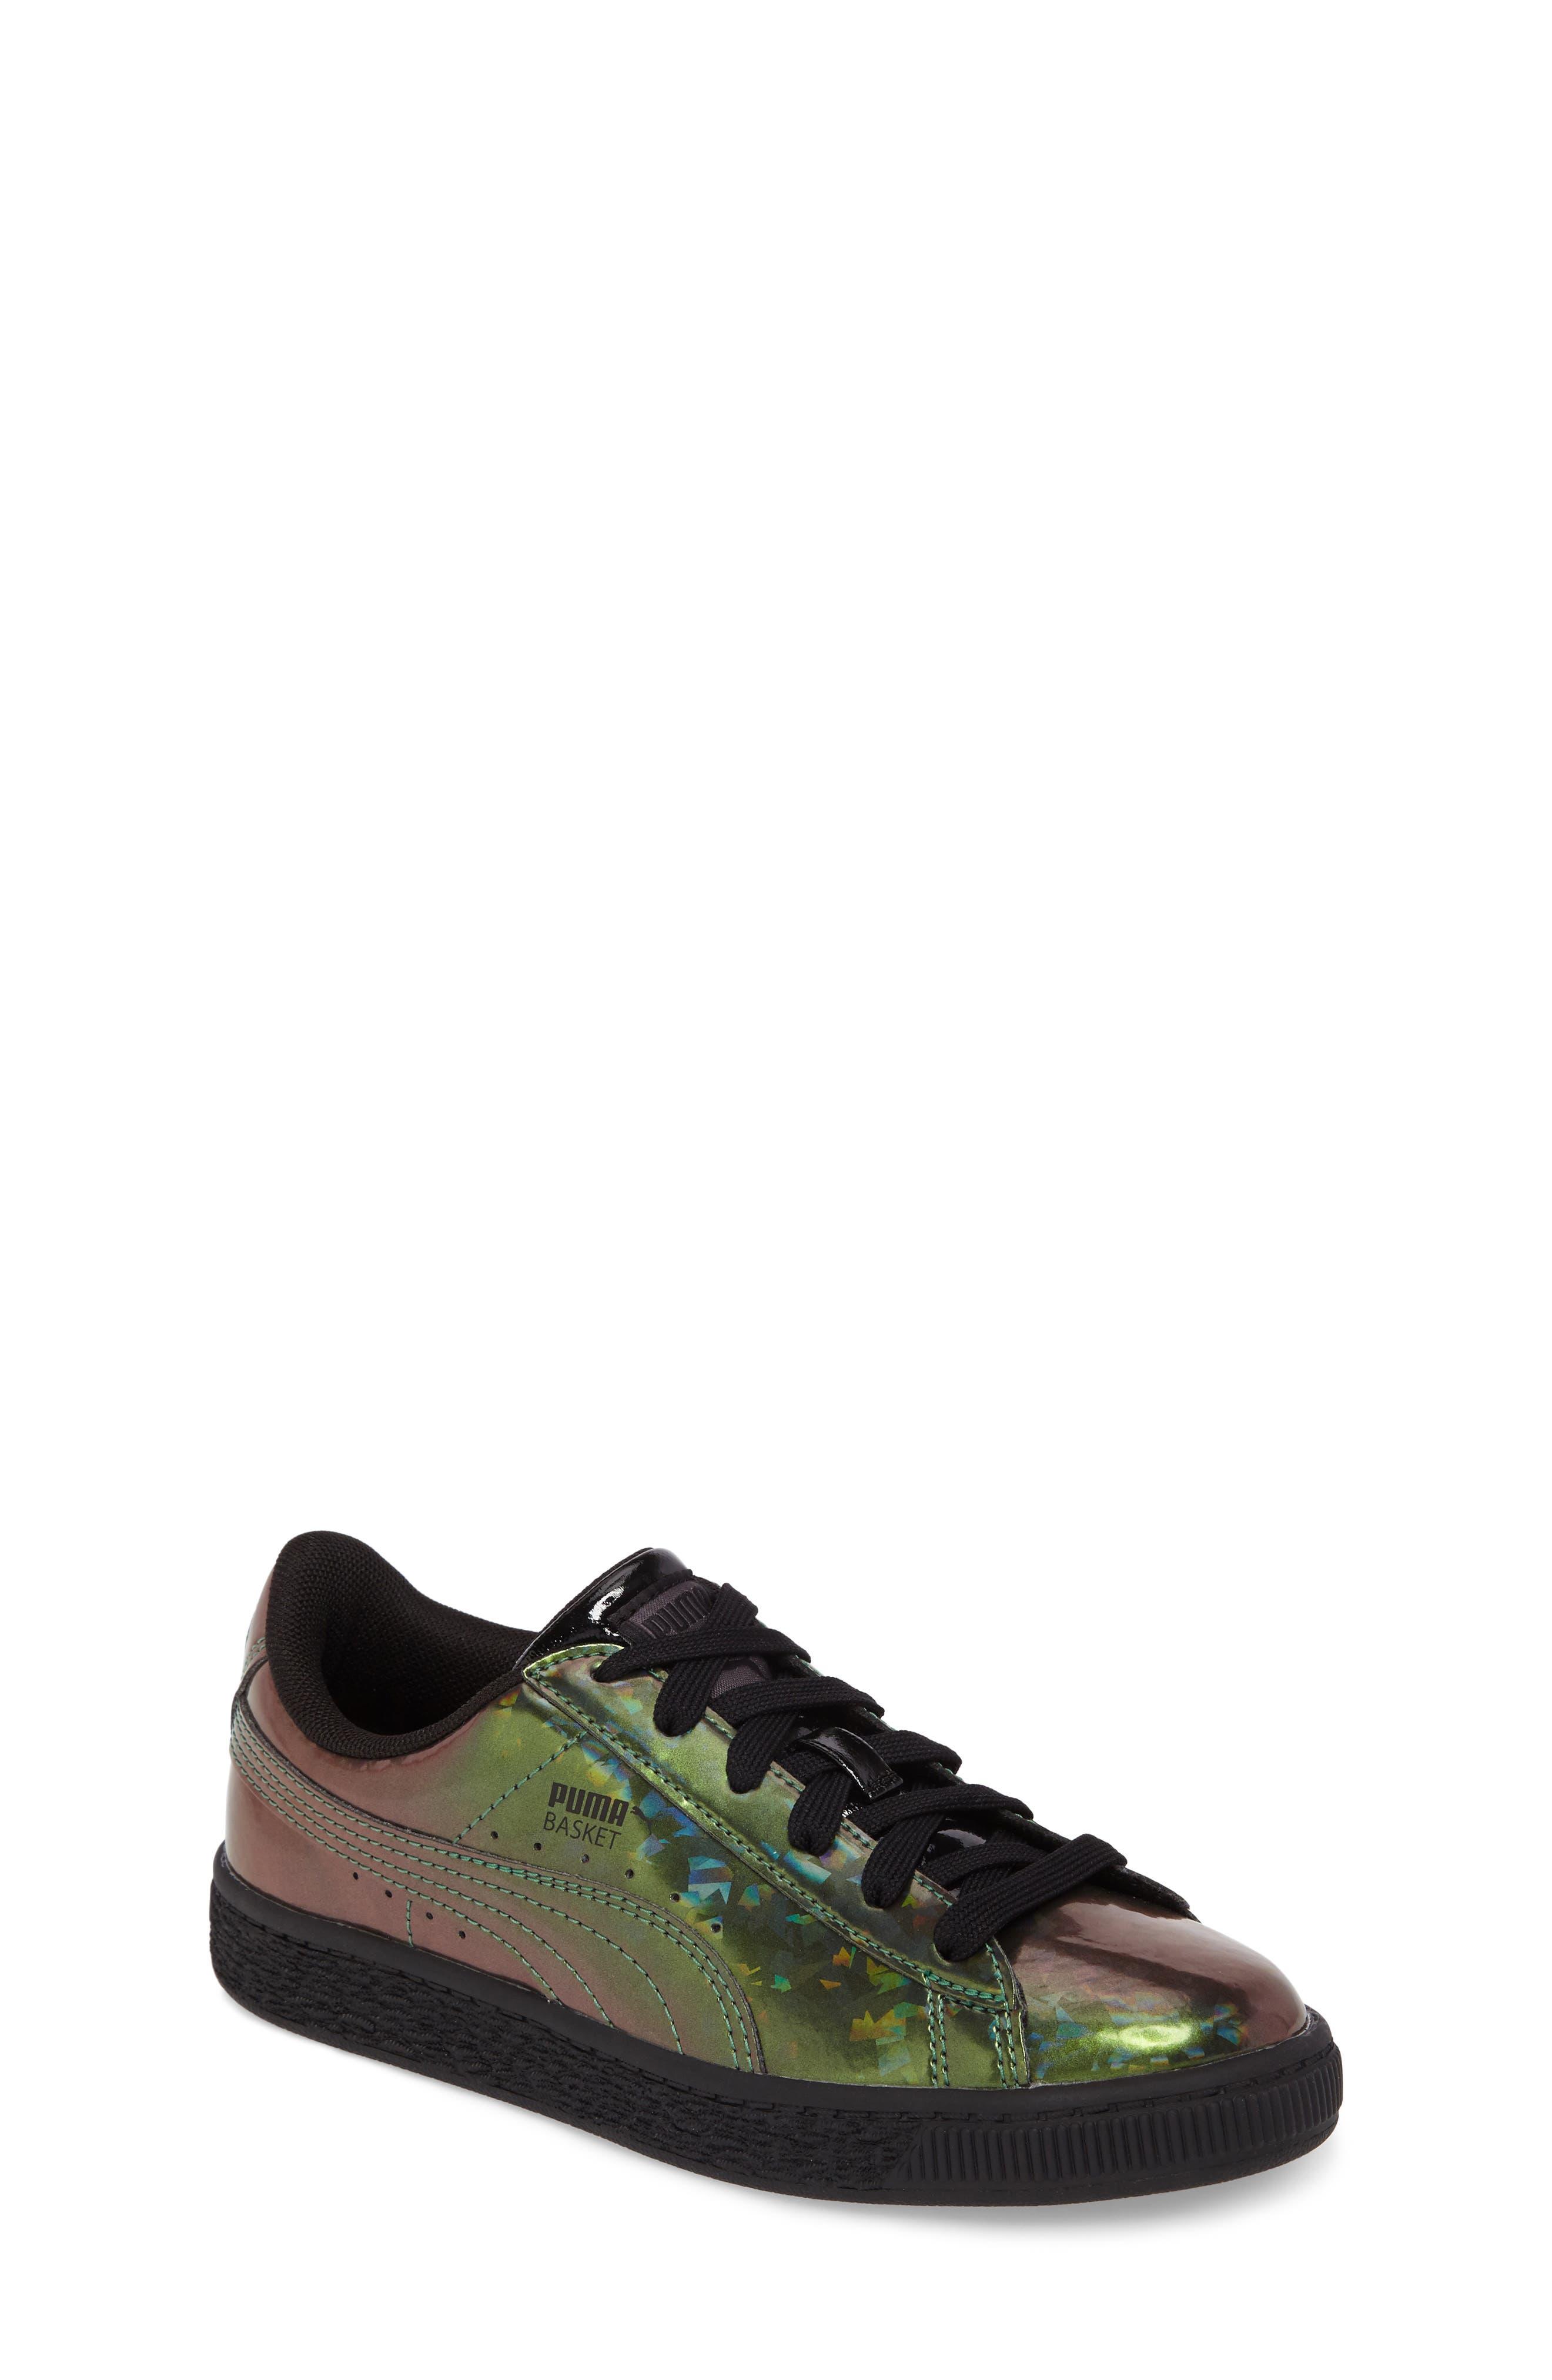 Basket Classic Holo PS Sneaker,                             Main thumbnail 1, color,                             001